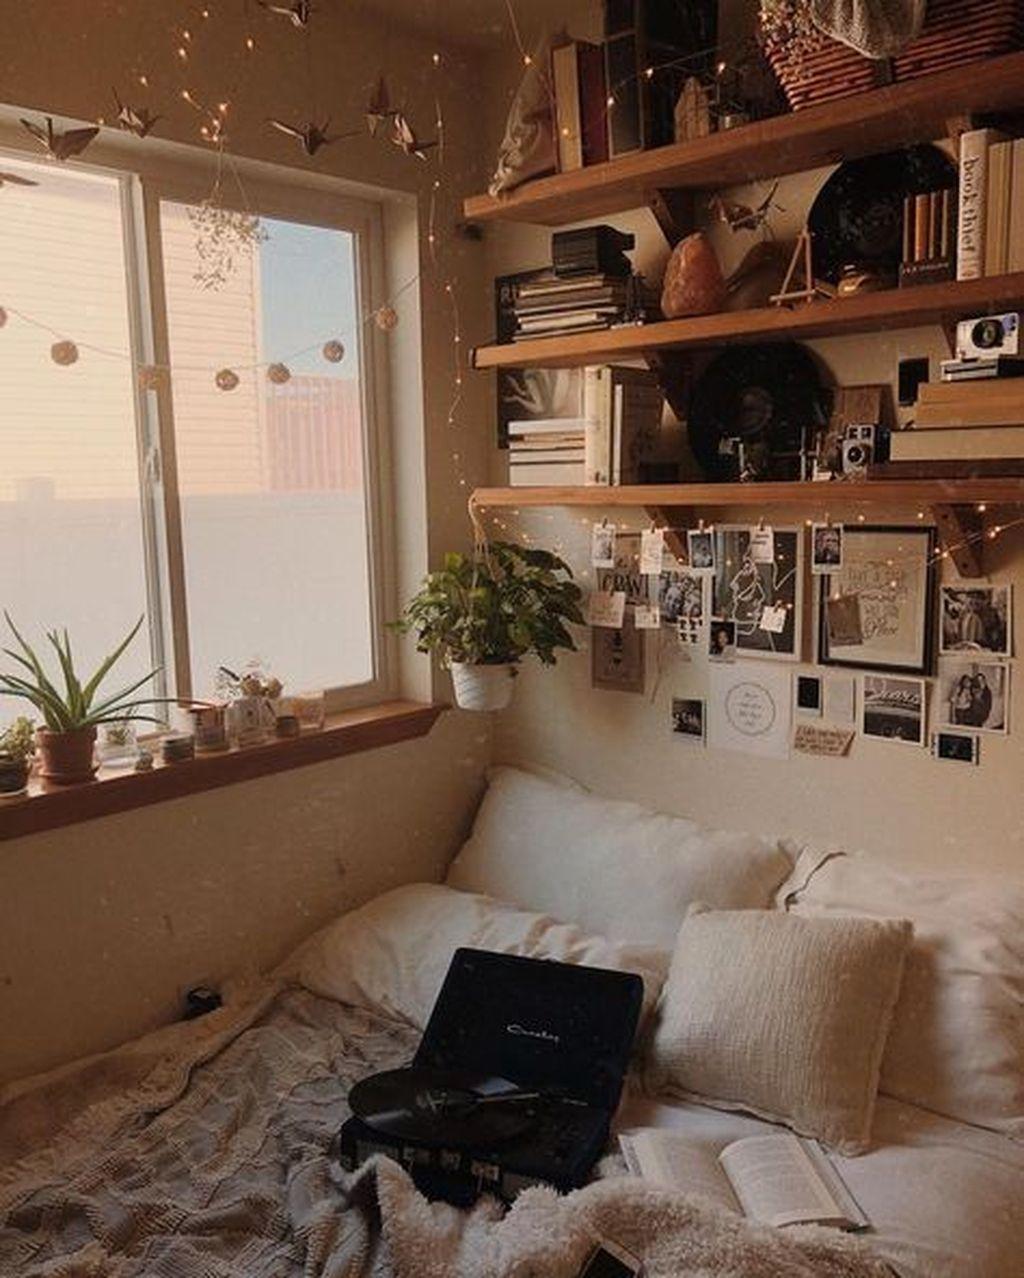 47 Charming Diy Dorm Room Decorating Ideas On A Budget